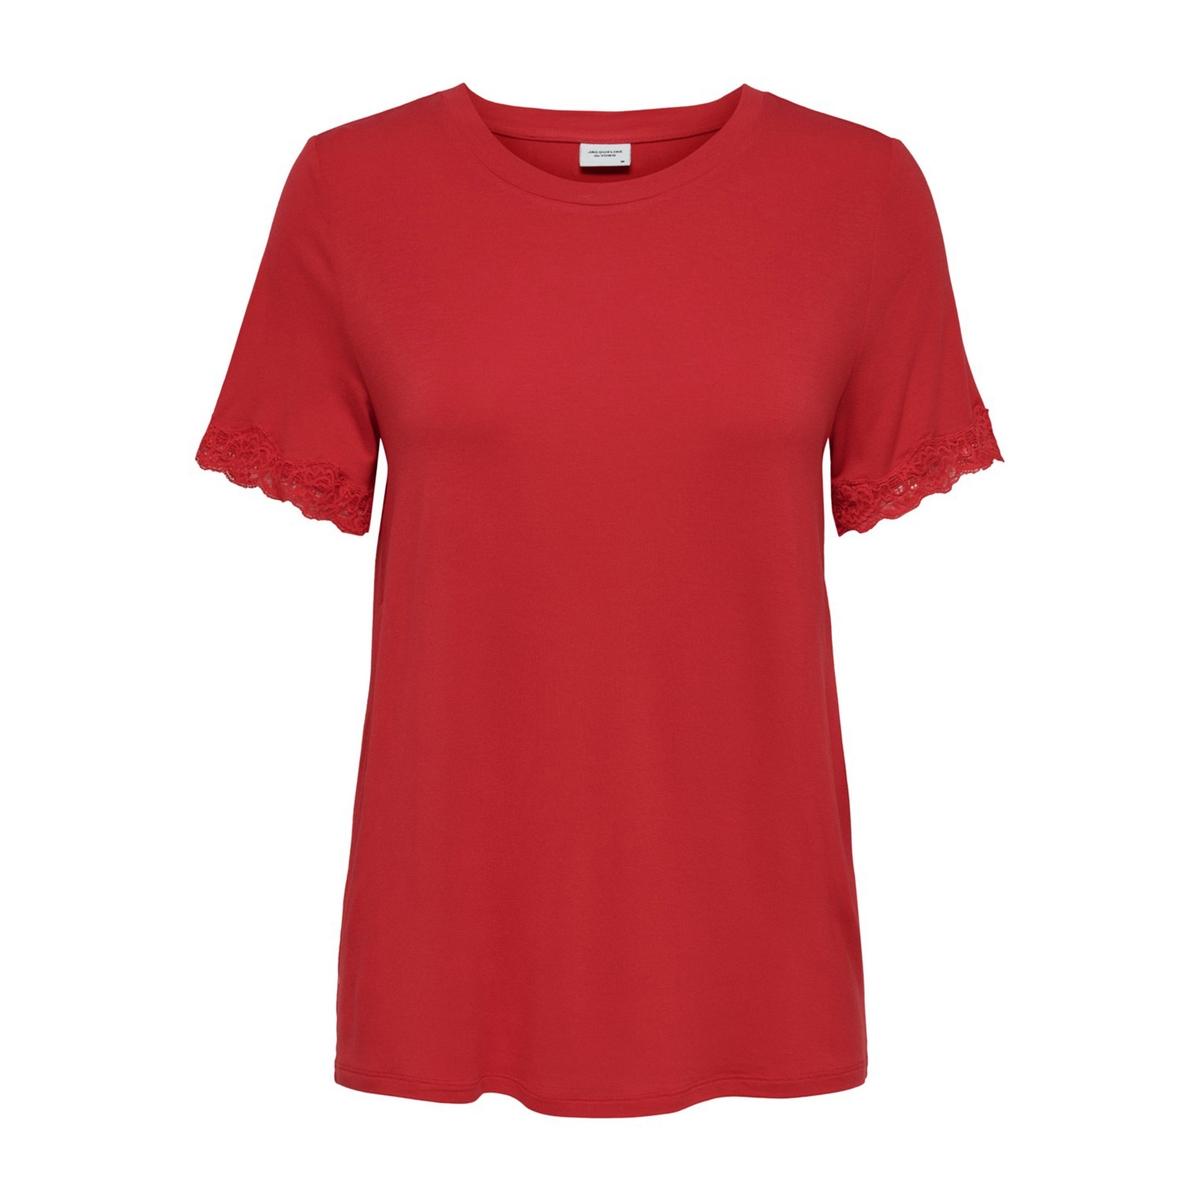 цена Футболка La Redoute С короткими рукавами L красный